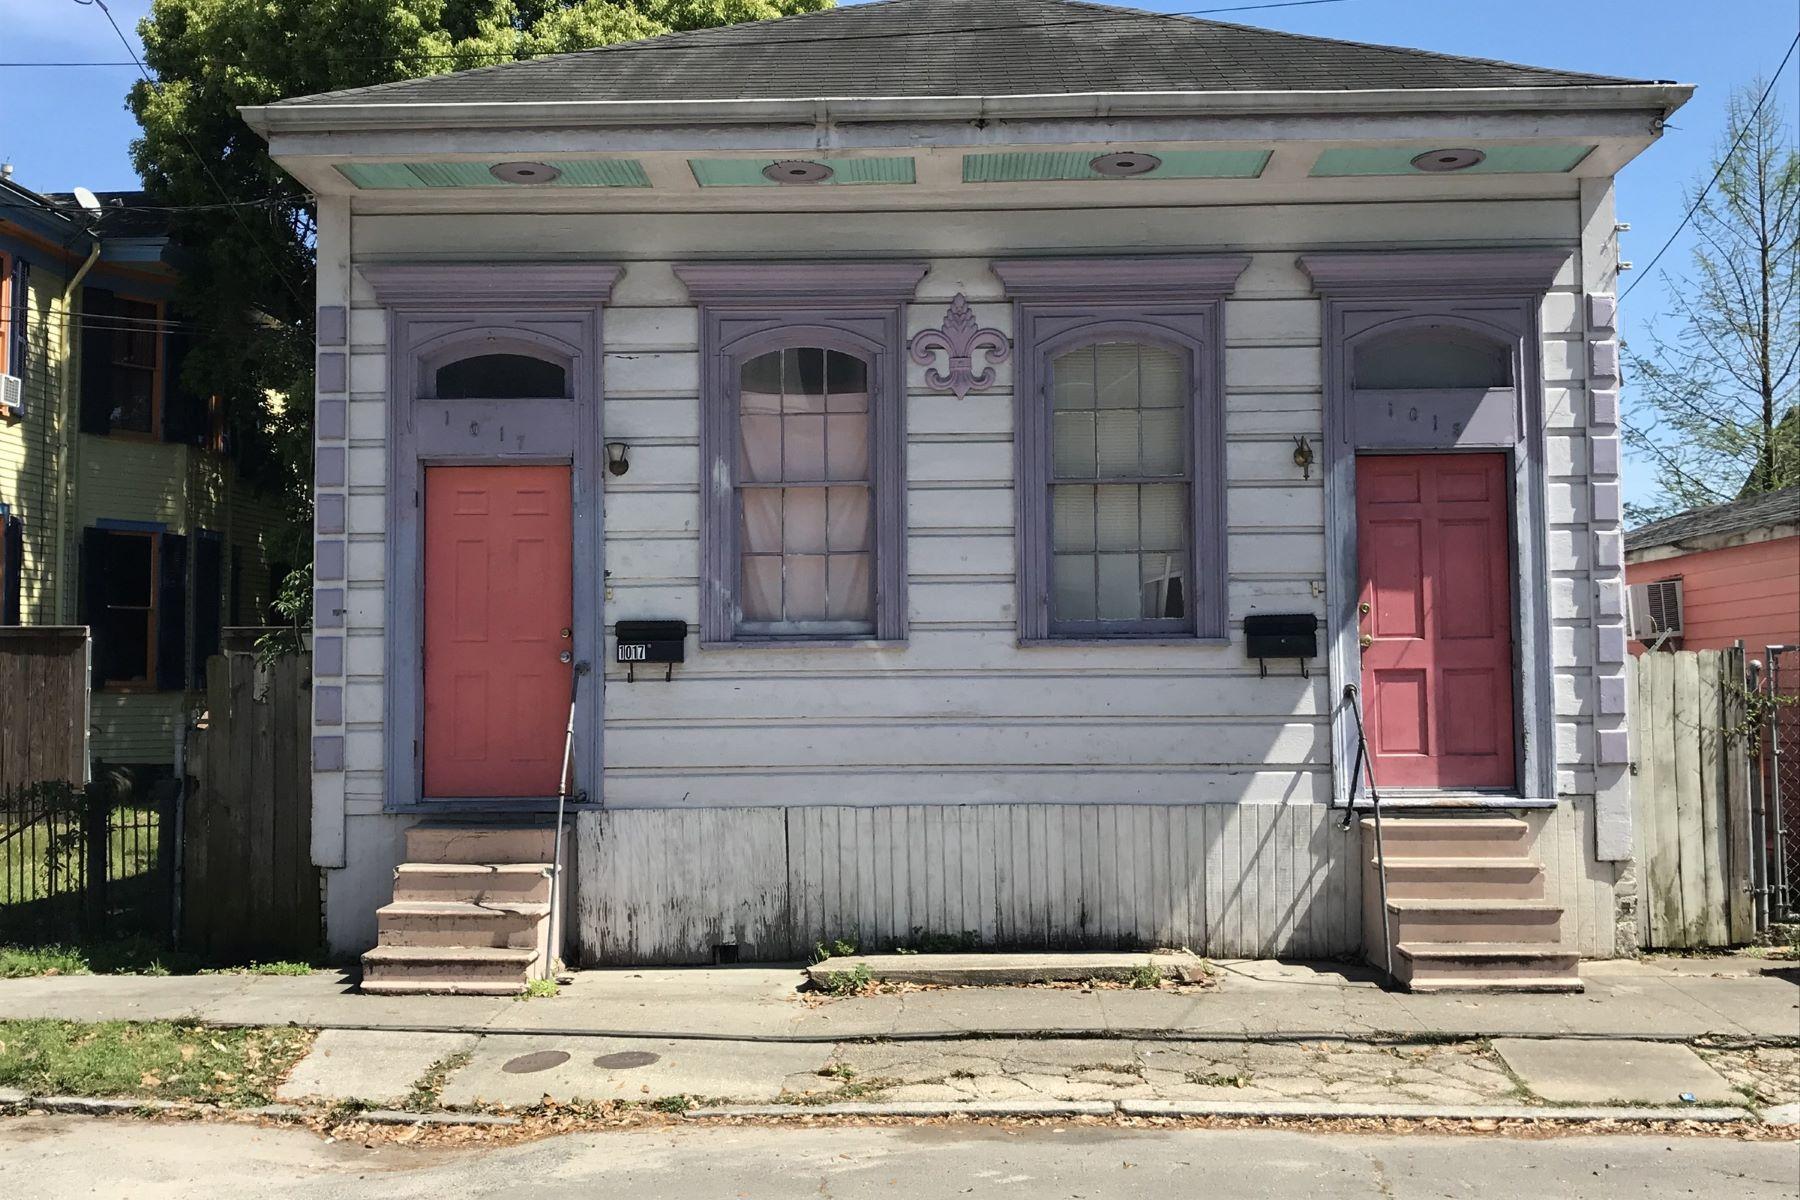 Multi-Family Home for Sale at 1015-17 Alvar Street, New Orleans 1015-17 Alvar St New Orleans, Louisiana 70117 United States